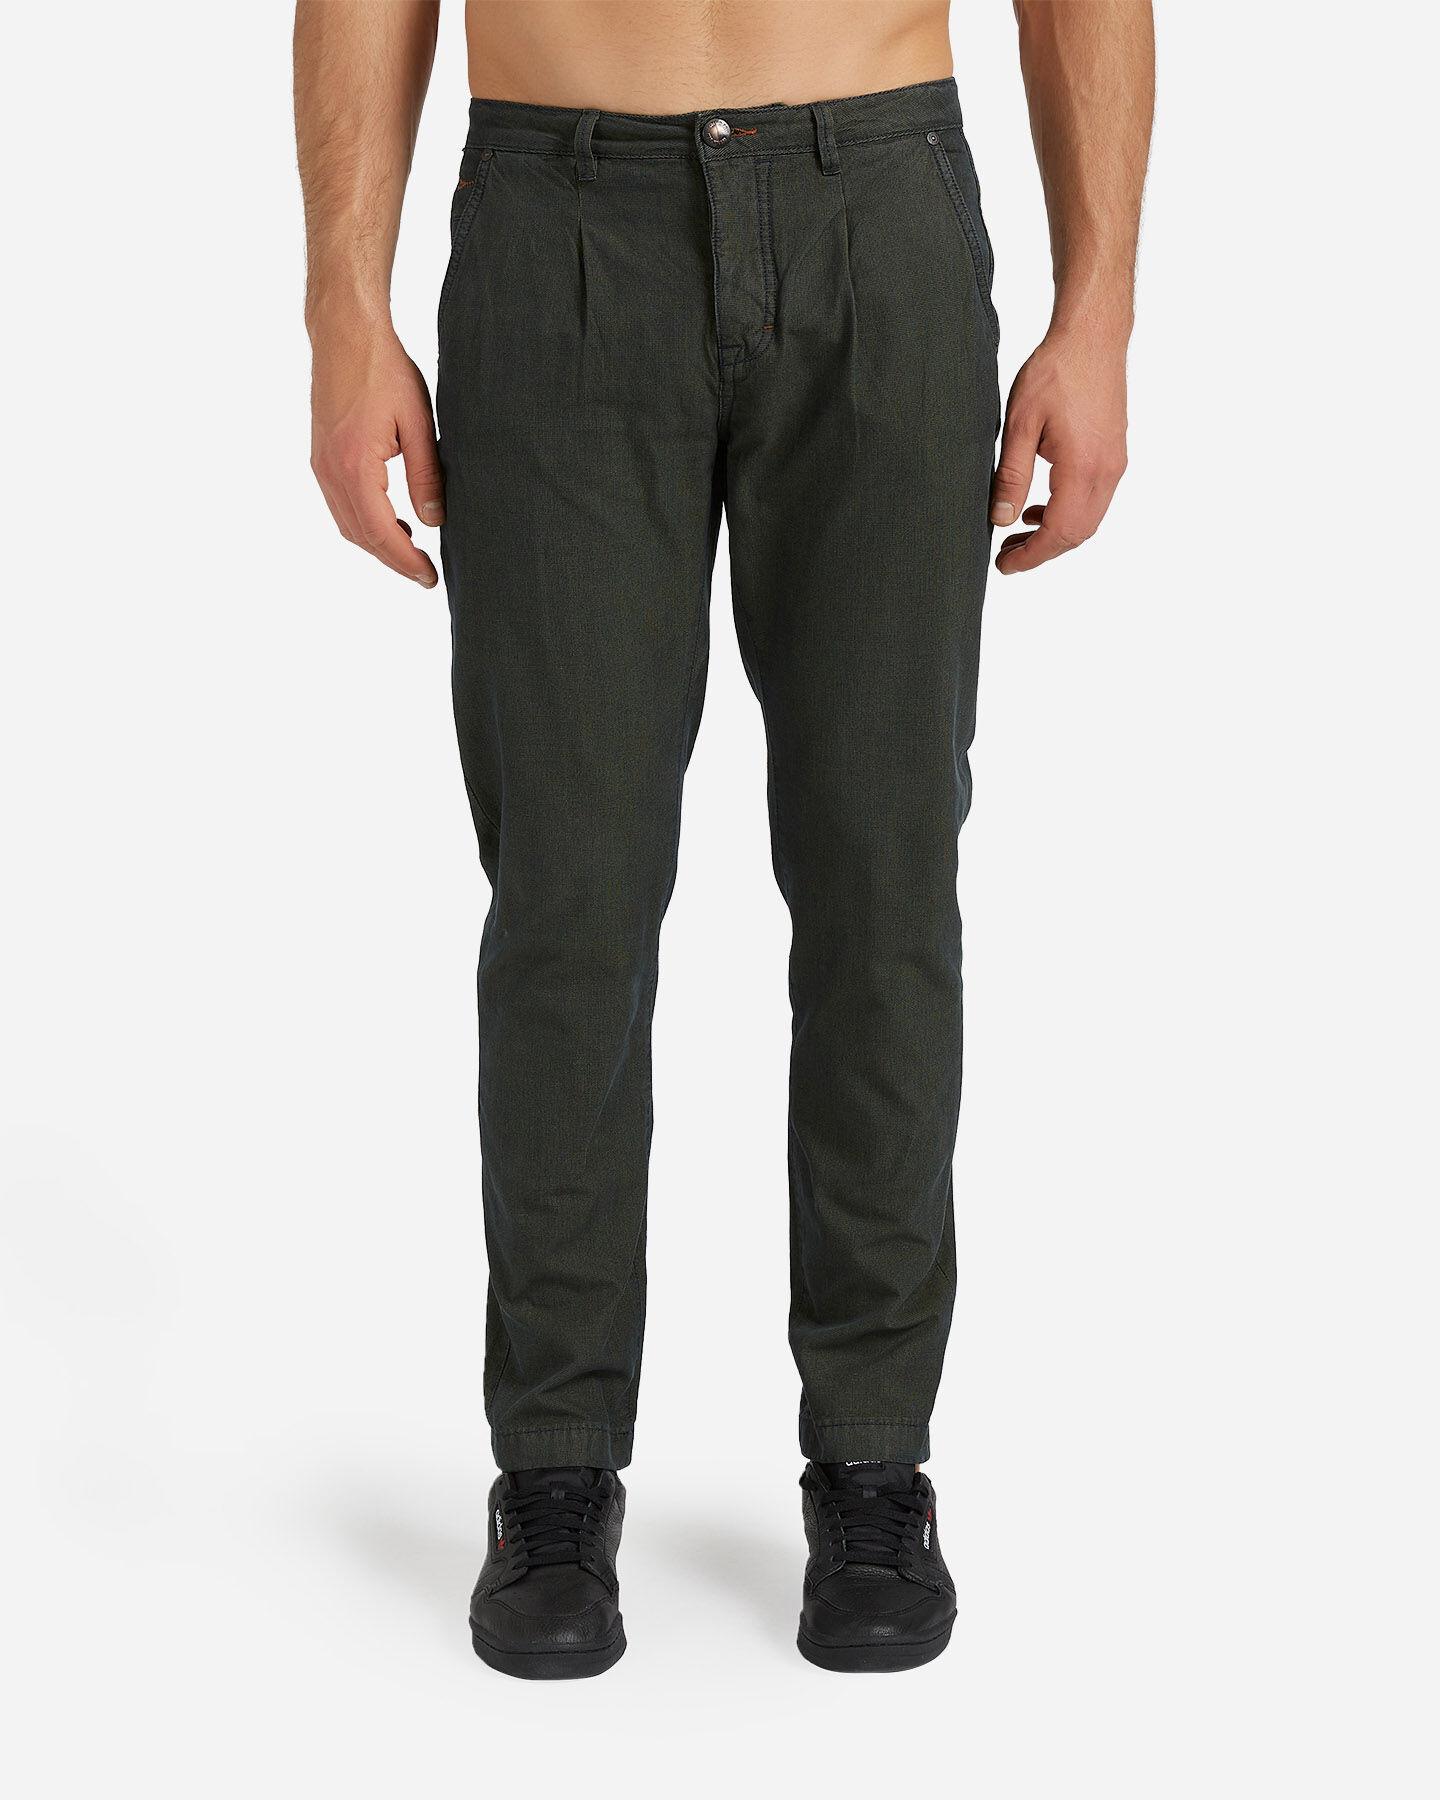 Pantalone COTTON BELT CHINO STRETCH M S4076644 scatto 0